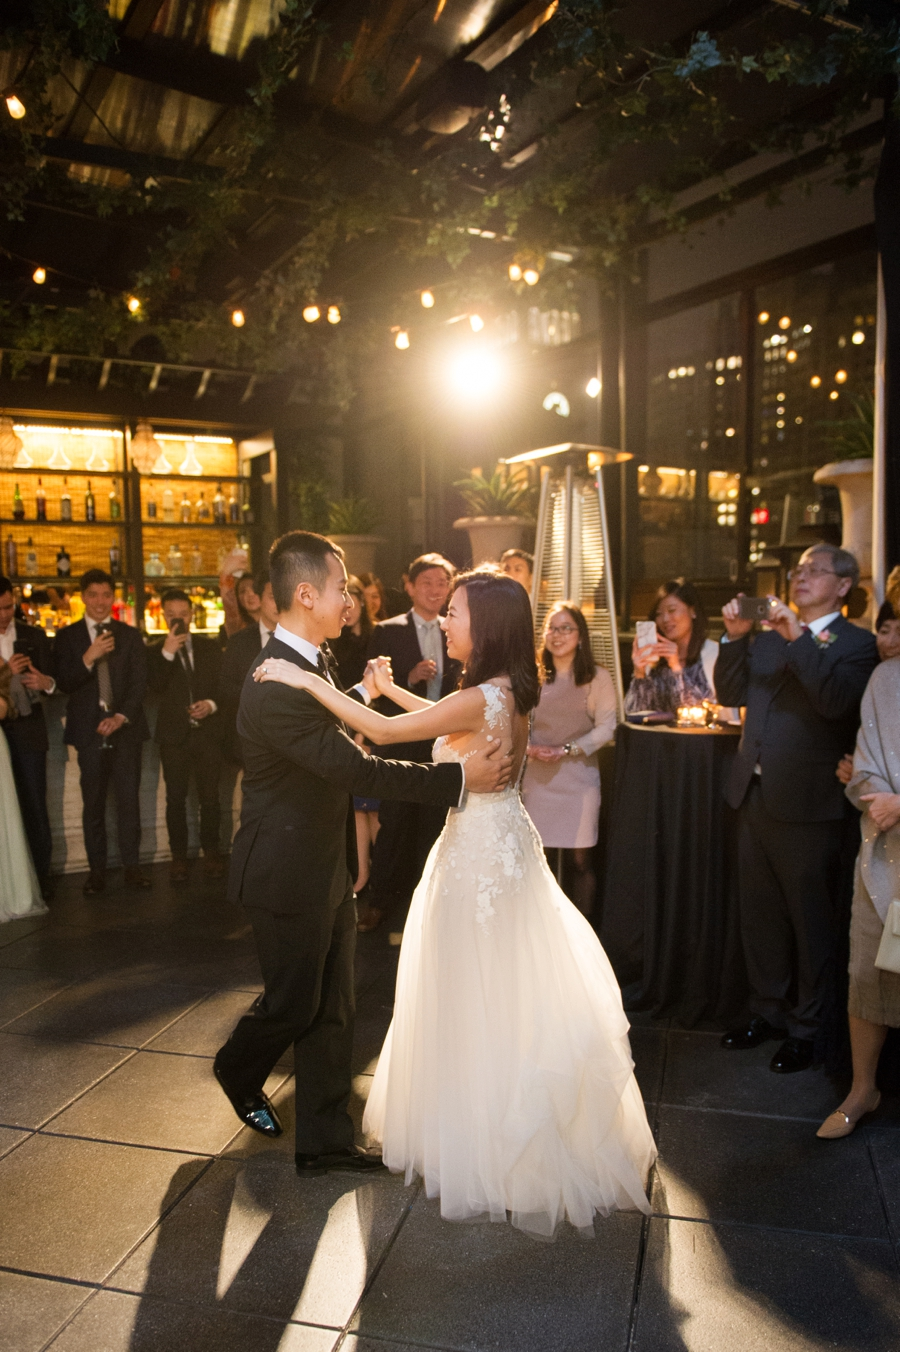 Gramercy_Park_Hotel_NYC_Wedding_AG_033.jpg